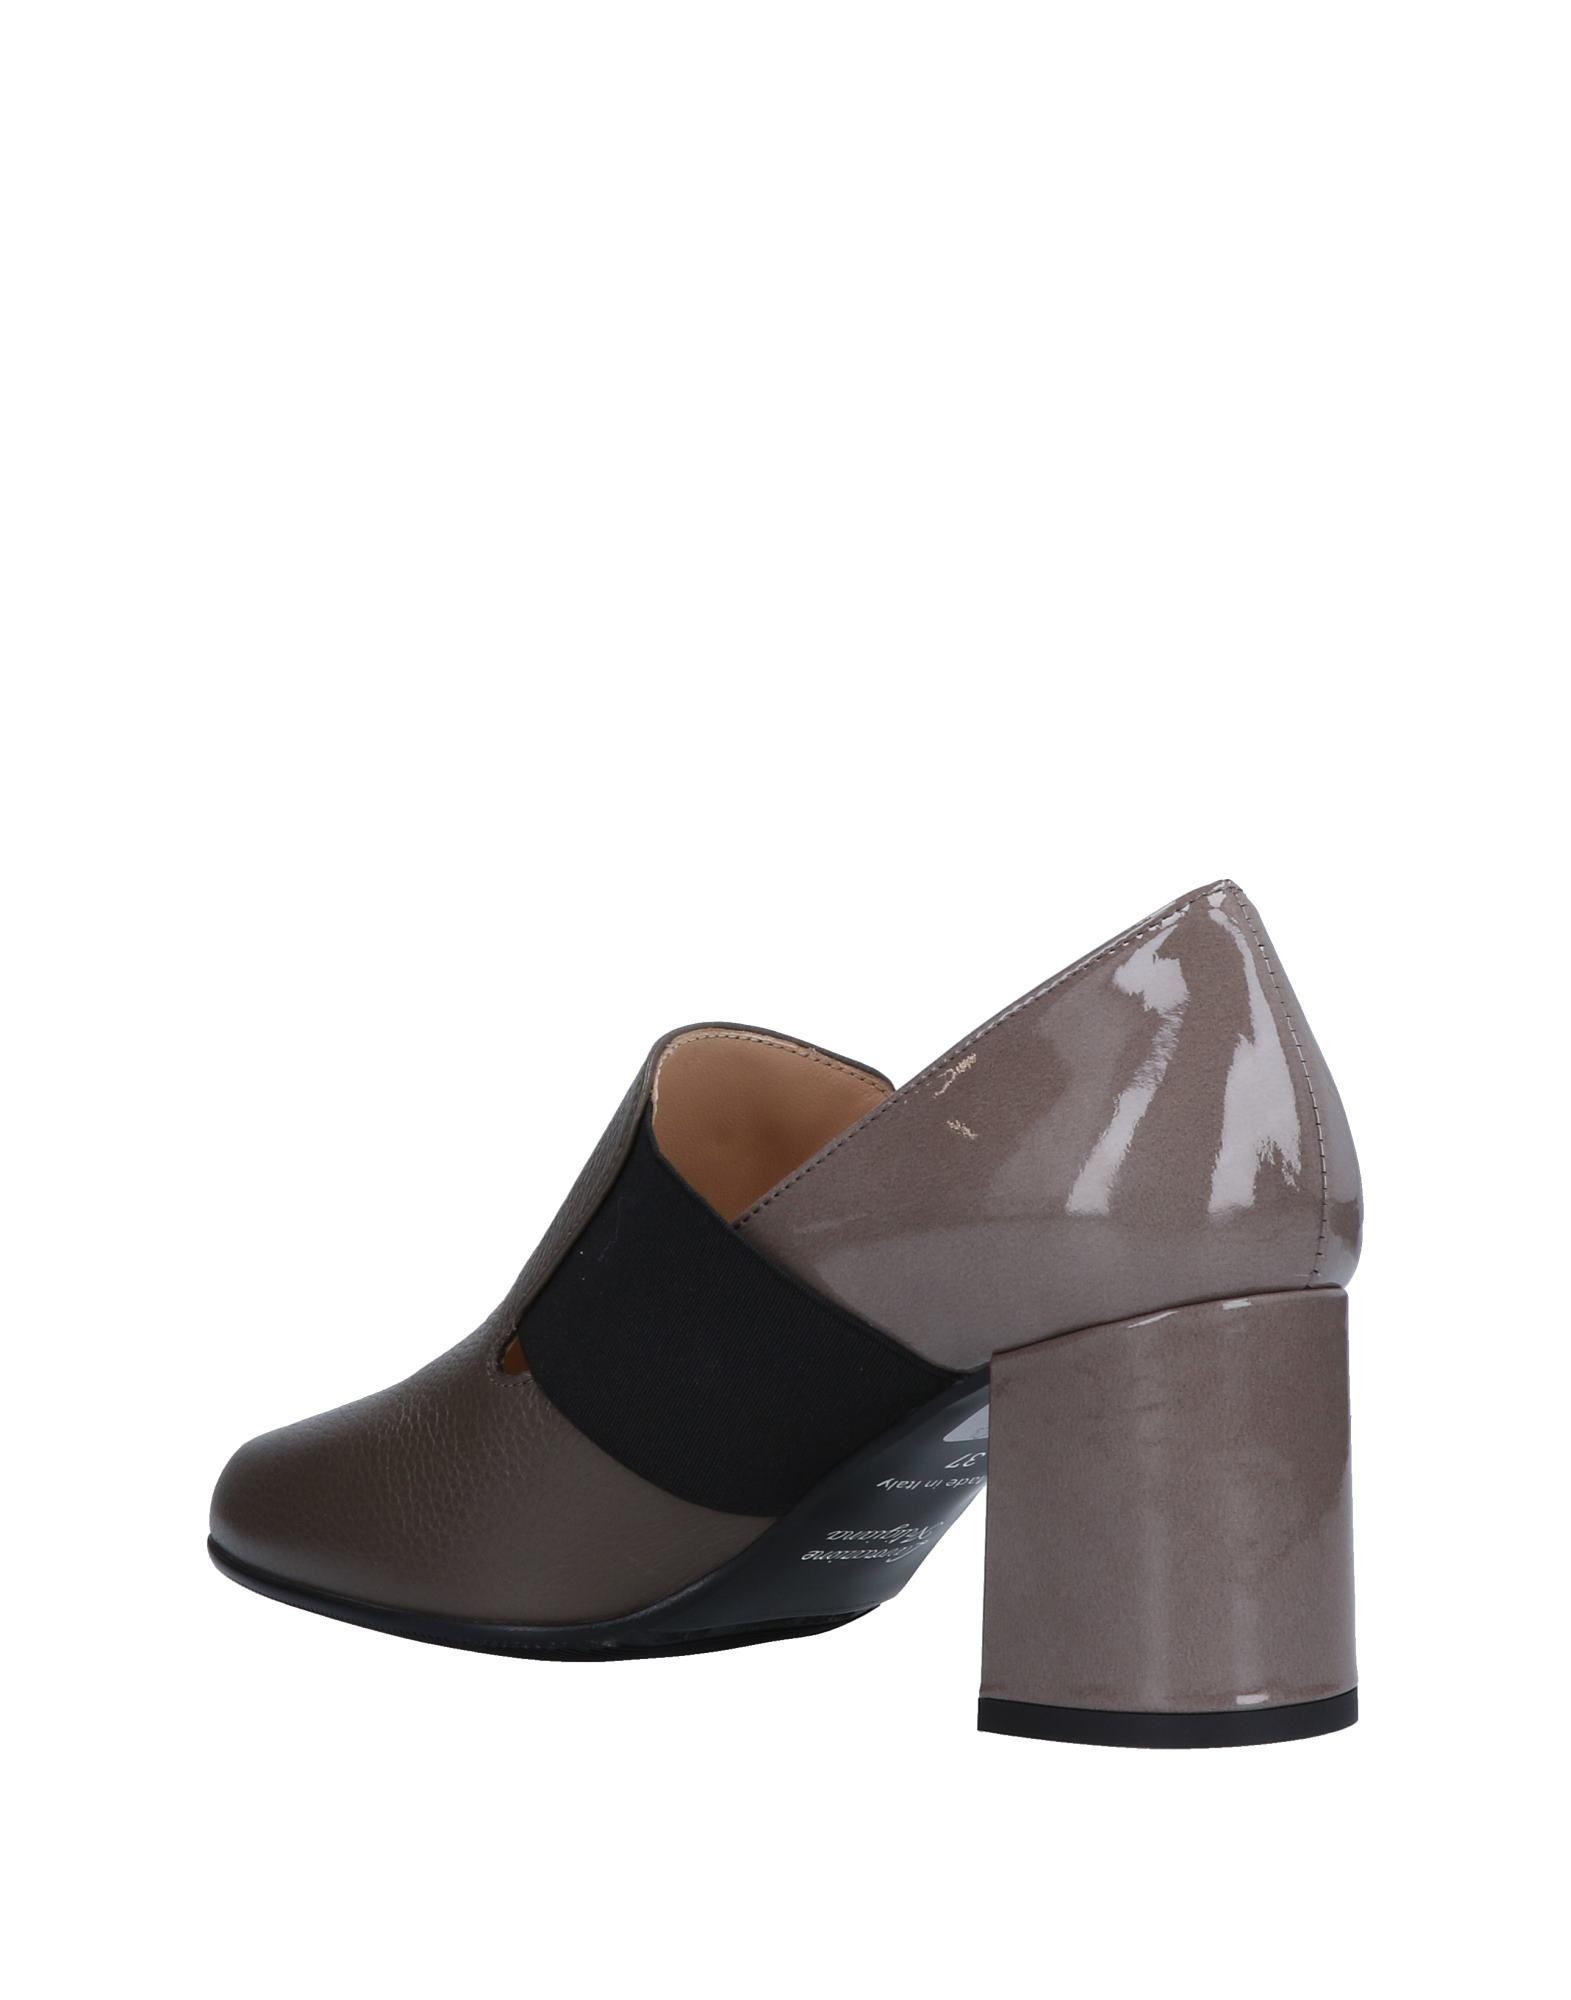 F.Lli Schuhe Bruglia Mokassins Damen  11517786AA Neue Schuhe F.Lli 471557